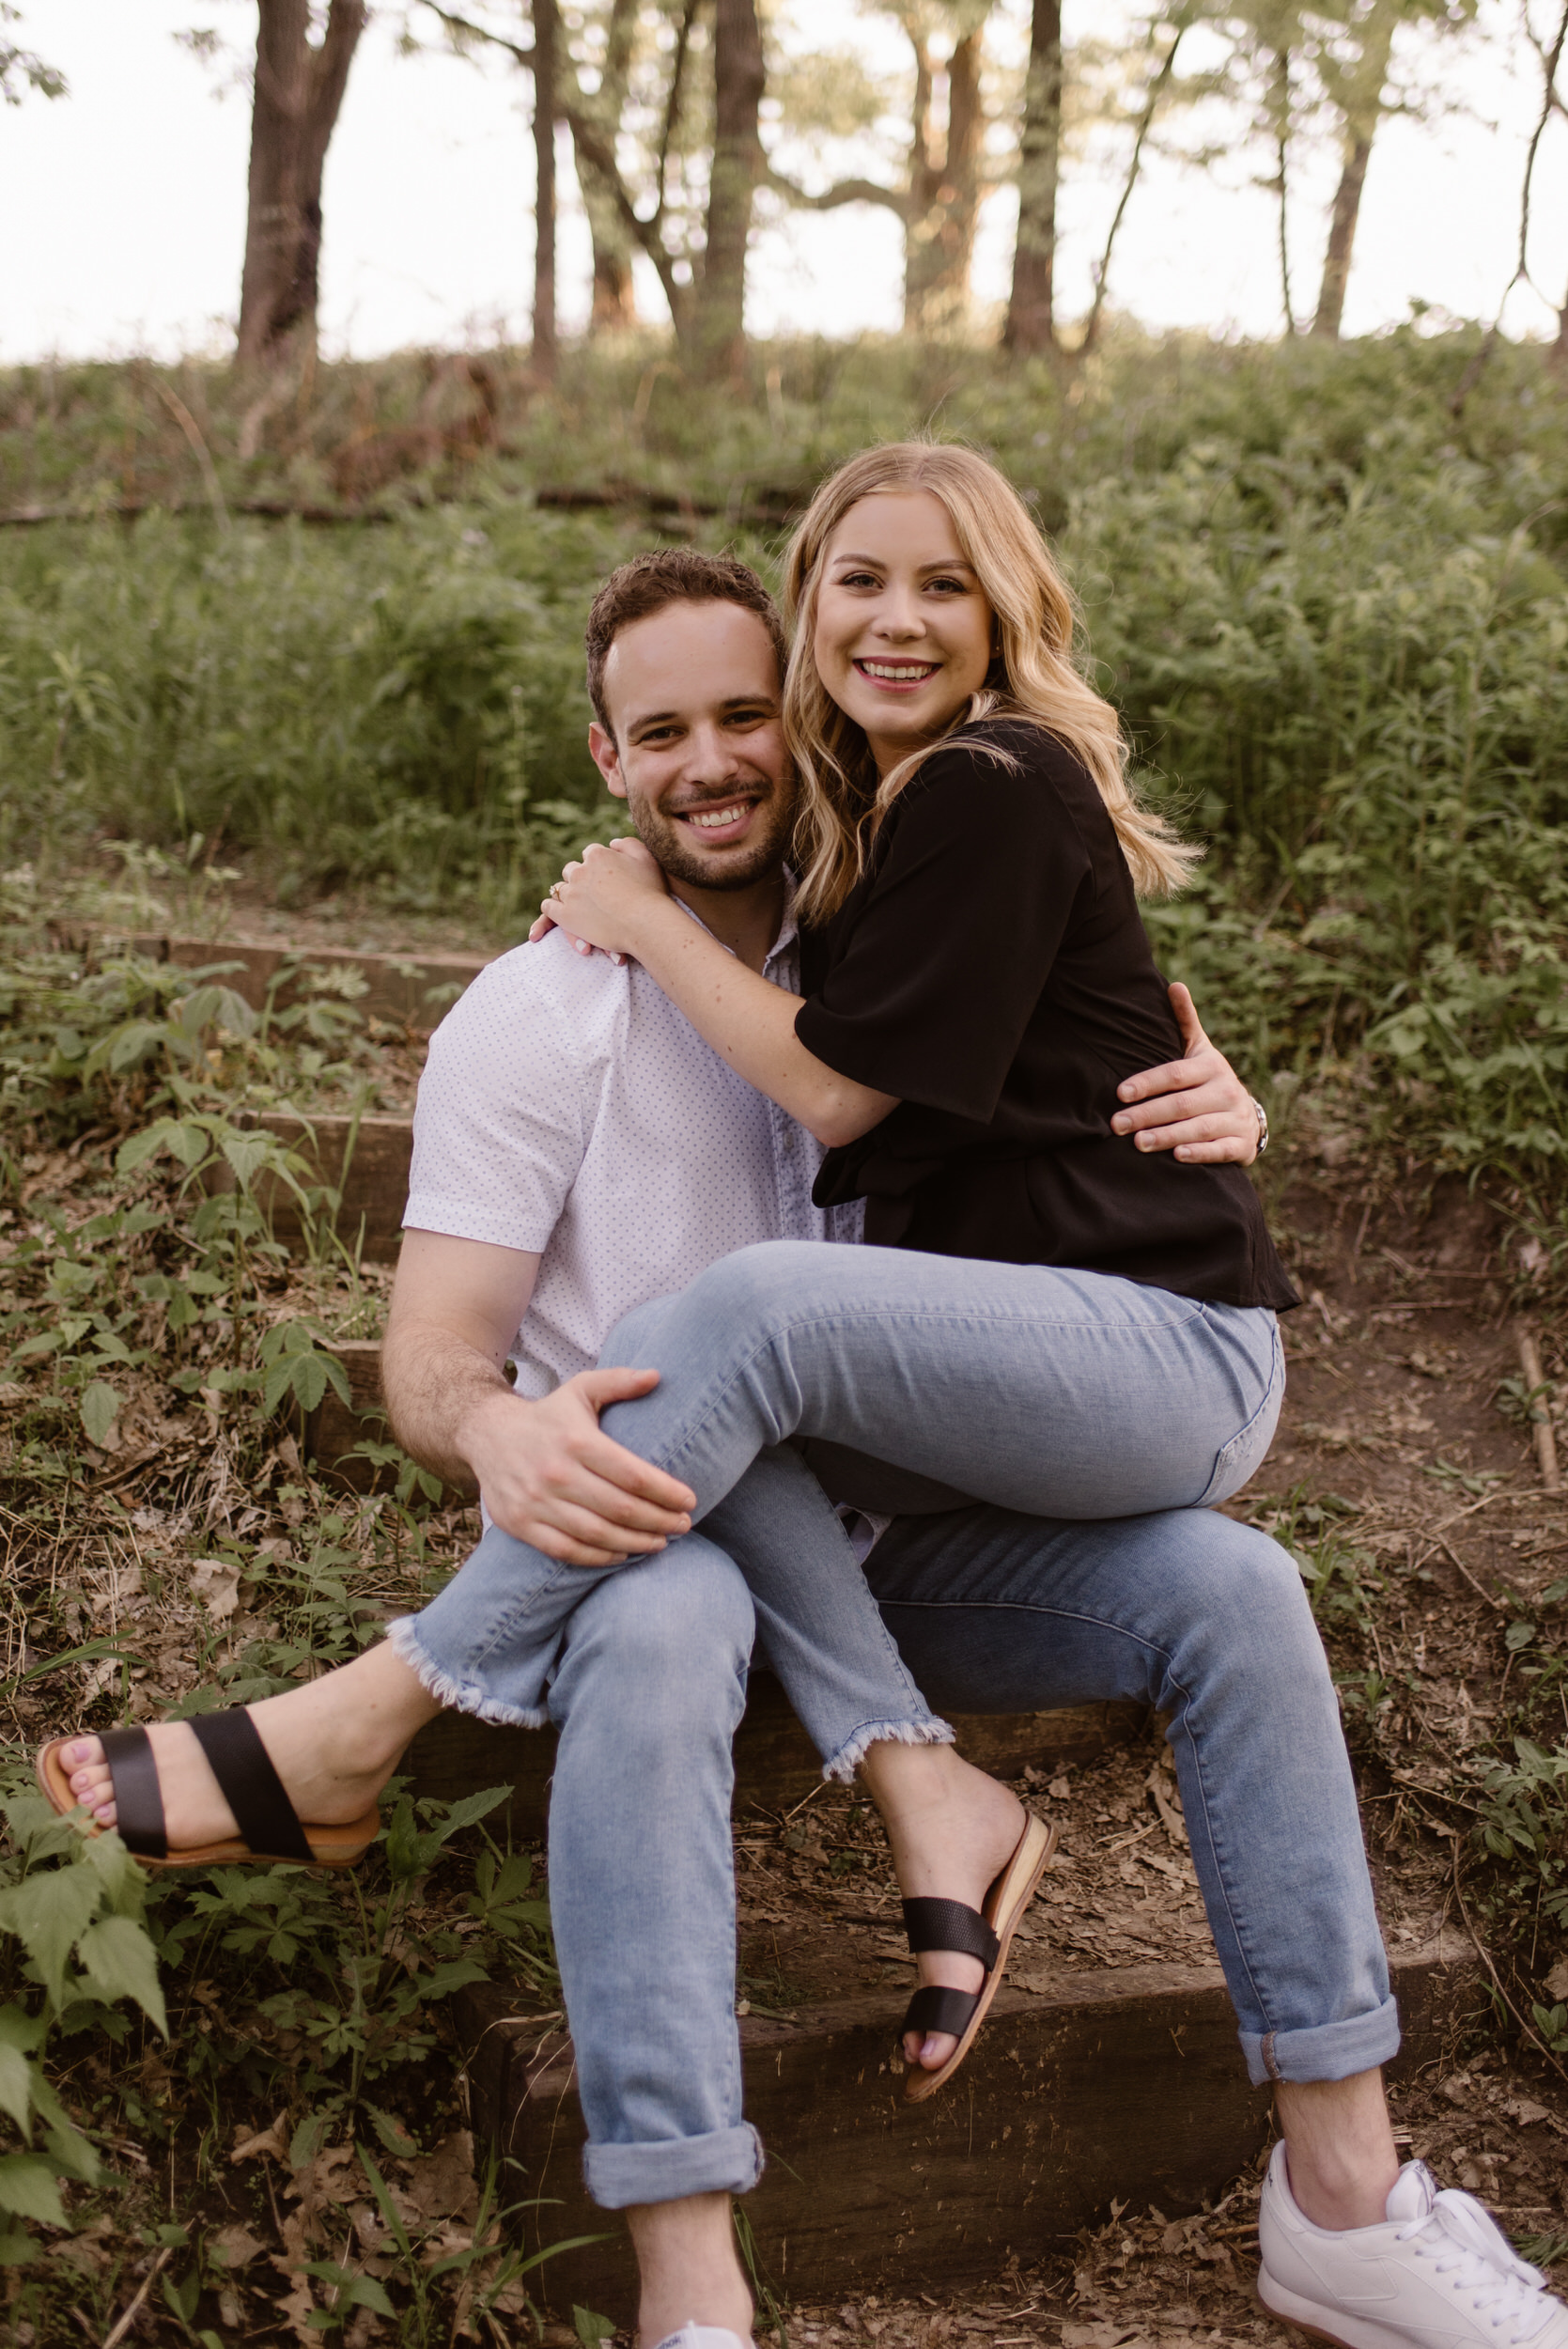 Omaha-Nebraska-Engagement-Session-Kaylie-Sirek-Photography-111.jpg